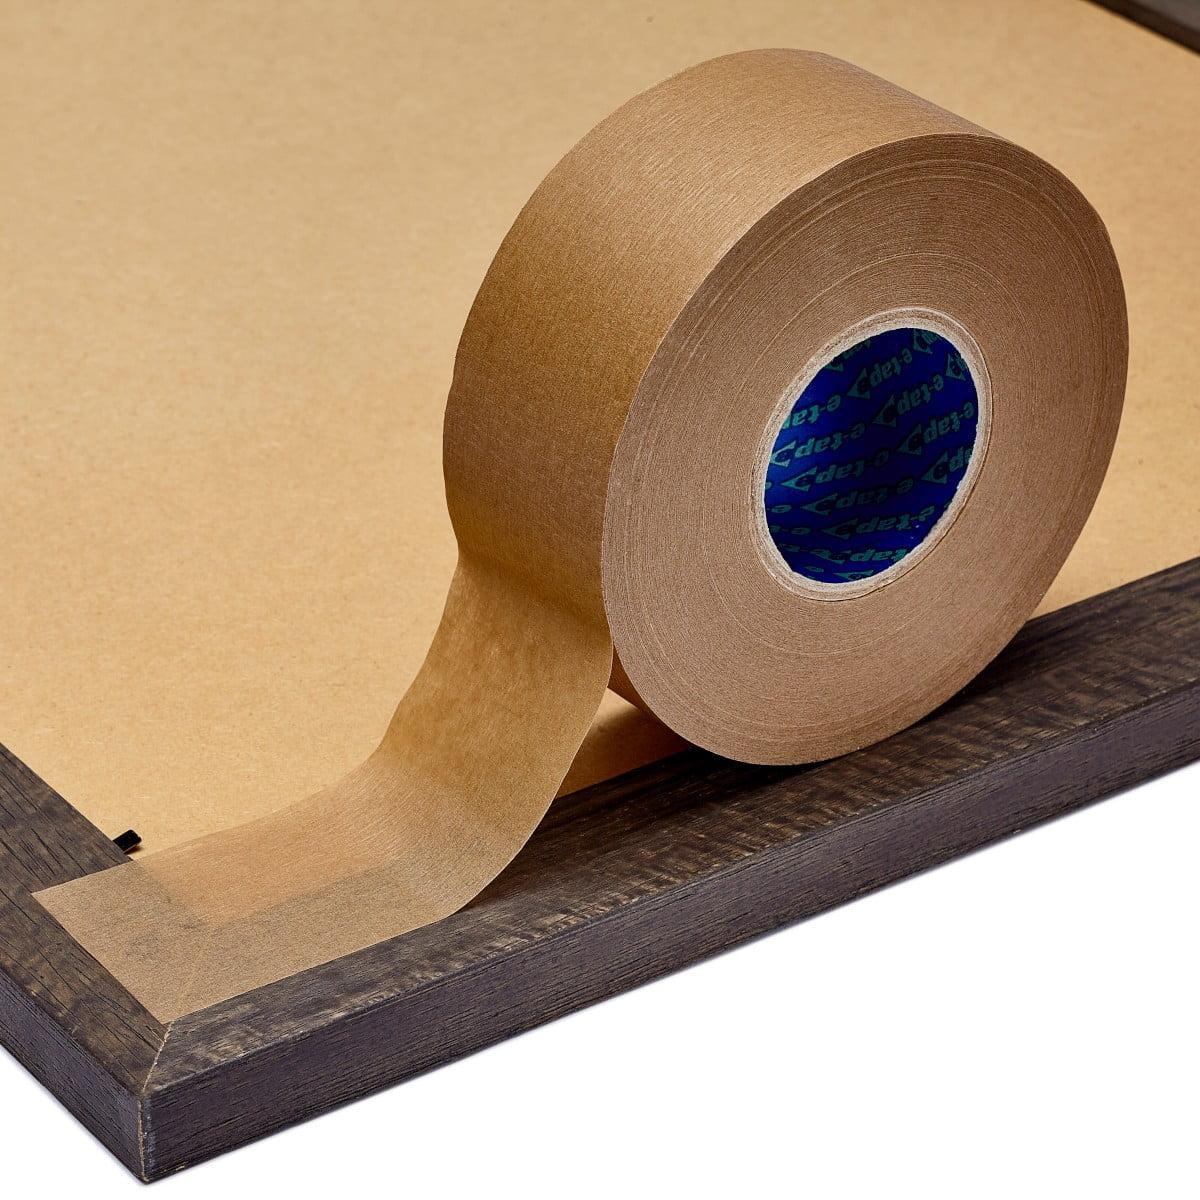 a 50 meter roll of eco-friendly kraft packaging tape